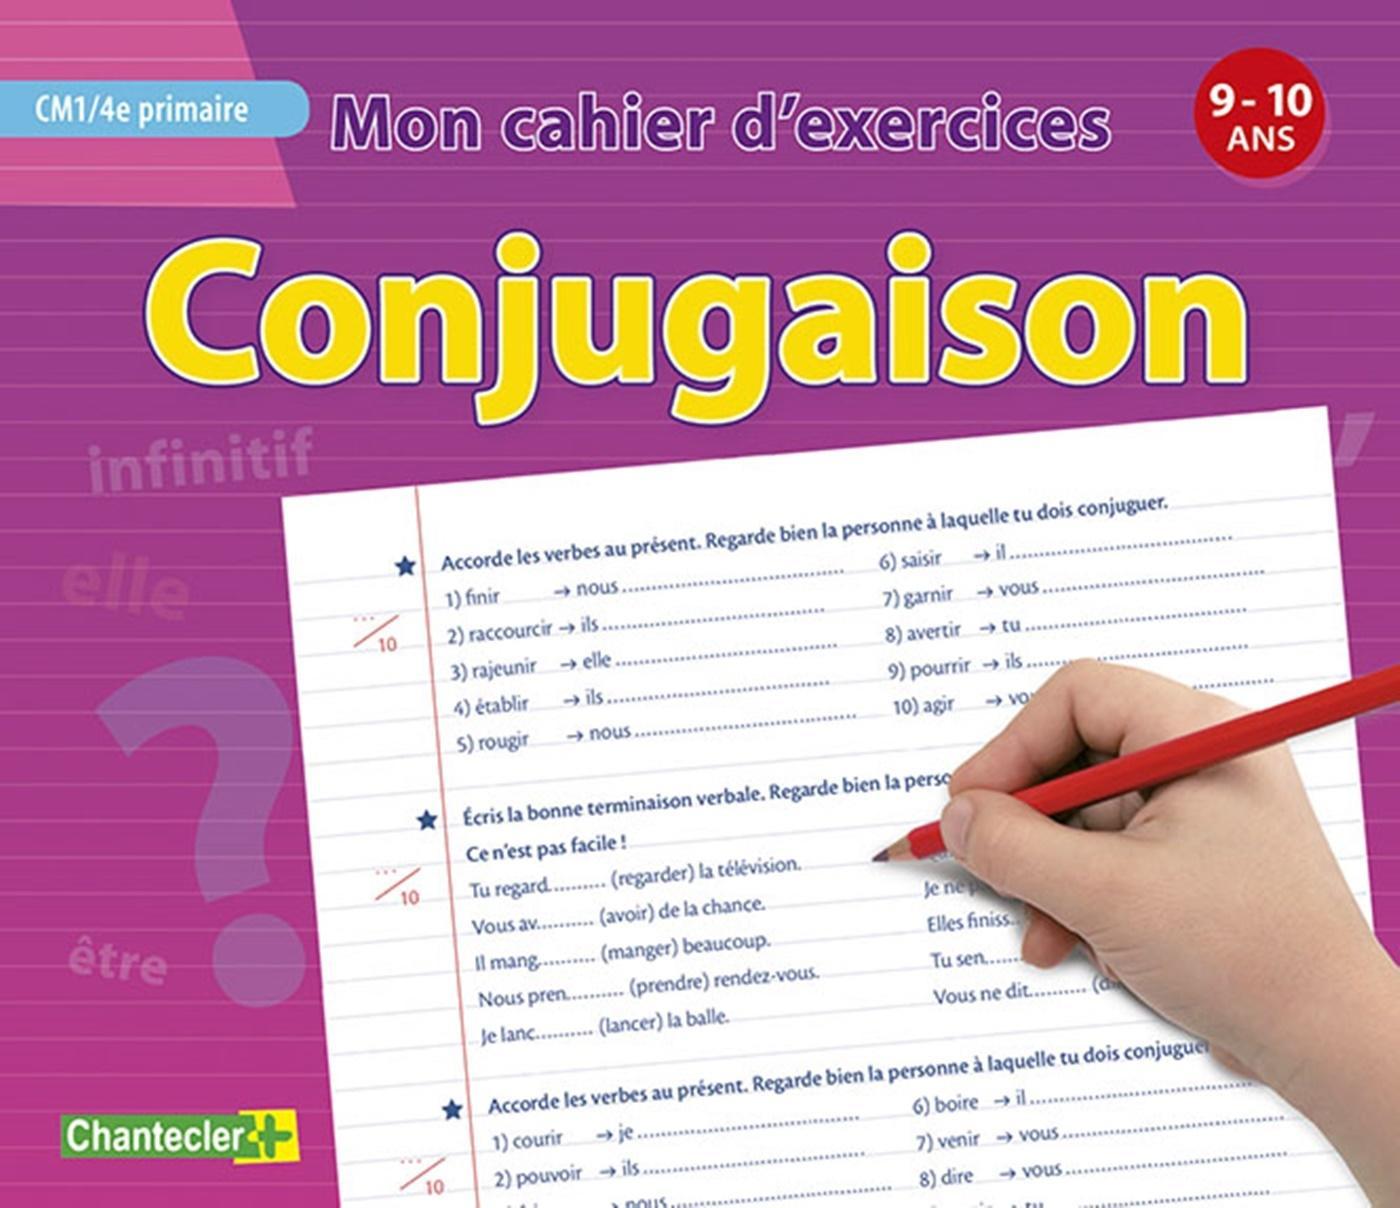 Mon Cahier D Exercices Conjugaison 9 10 A Cm1 4e Primaire Librairie Eyrolles